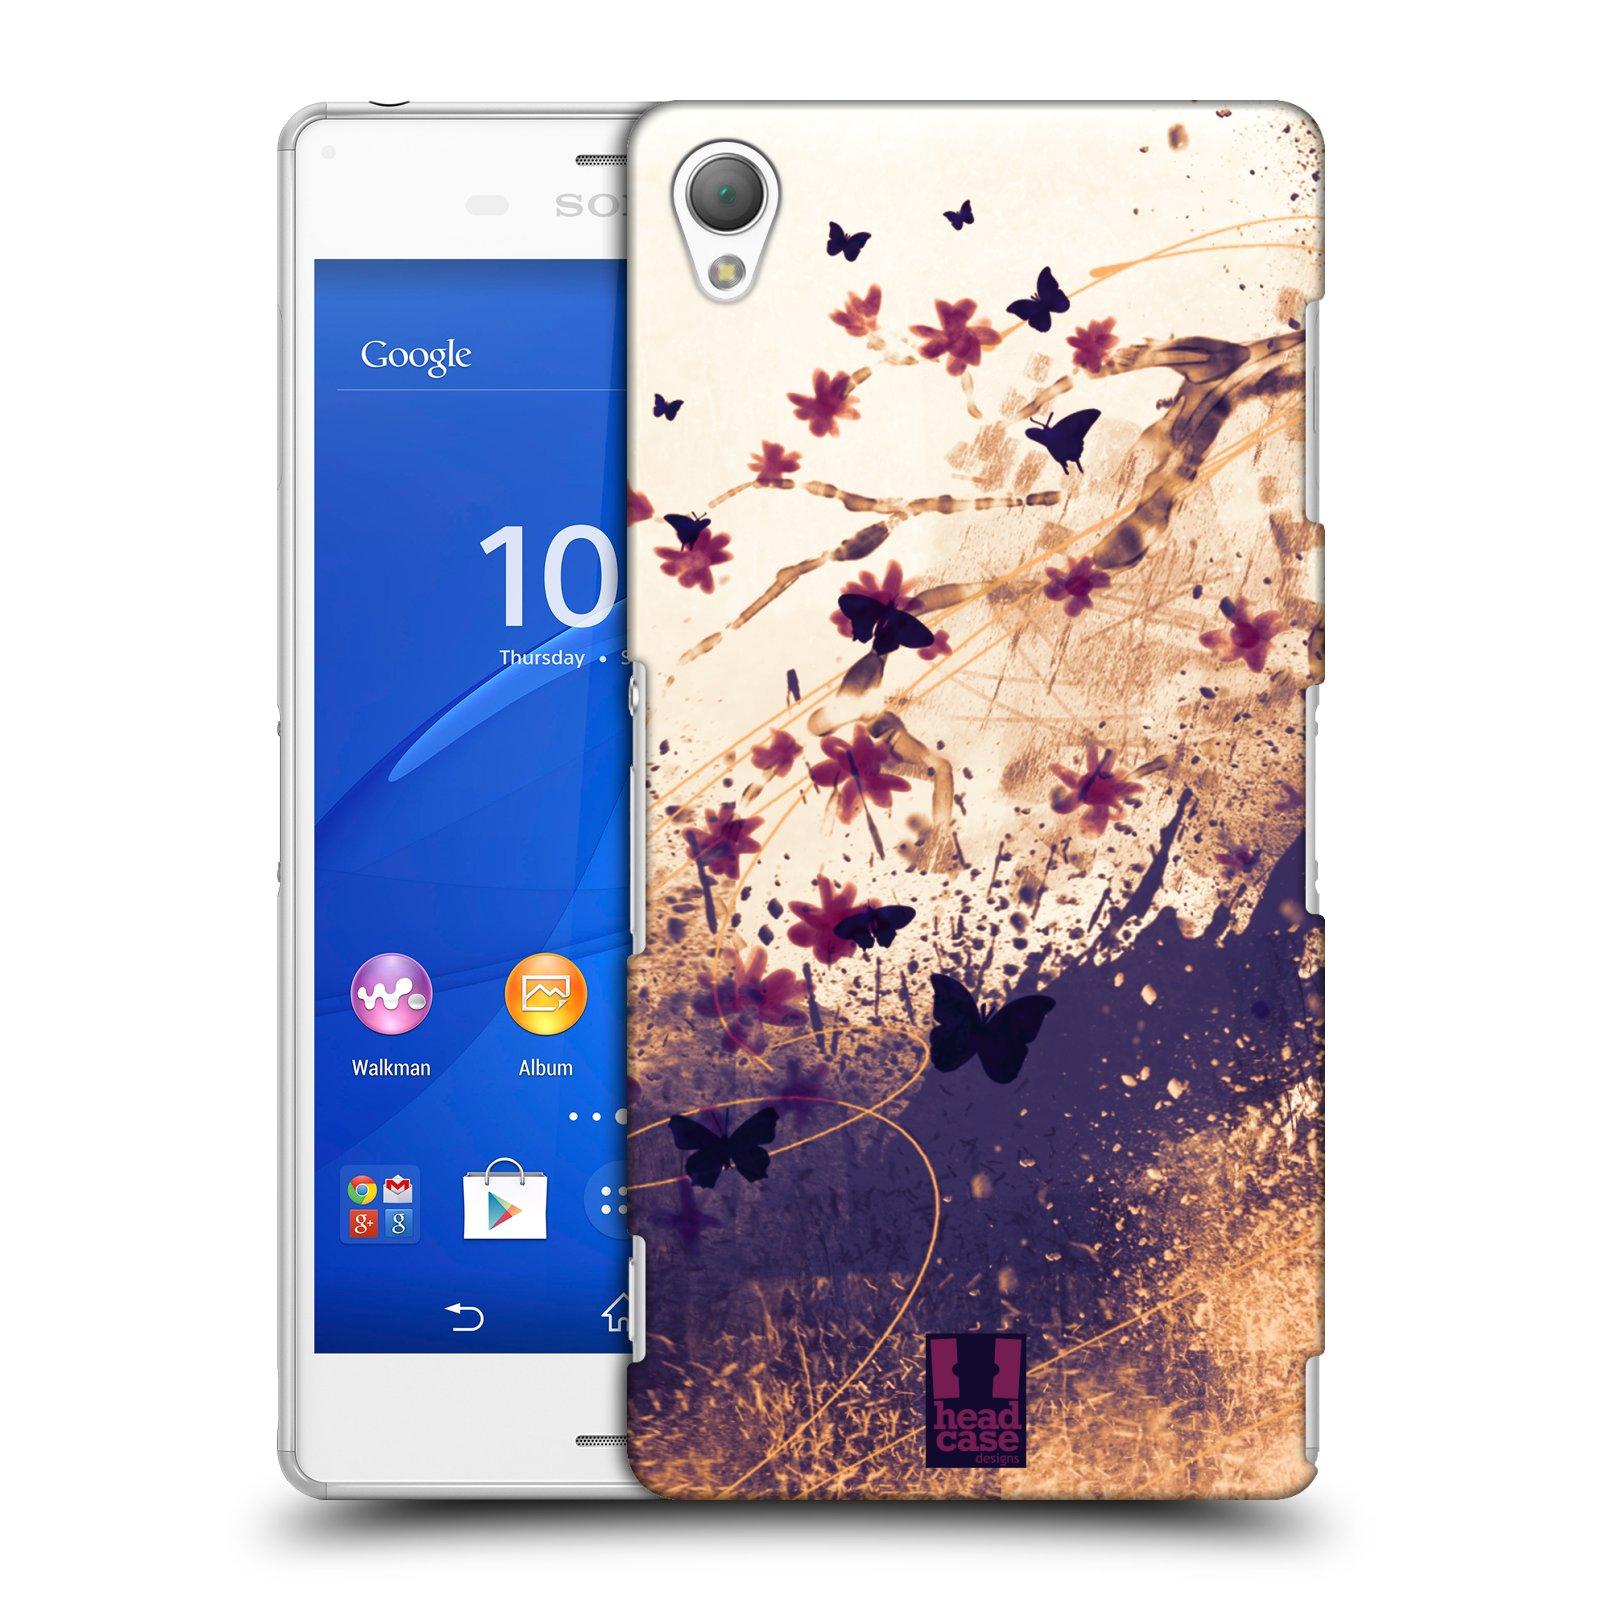 Plastové pouzdro na mobil Sony Xperia Z3 D6603 HEAD CASE MOTÝLCI (Kryt či obal na mobilní telefon Sony Xperia Z3 )